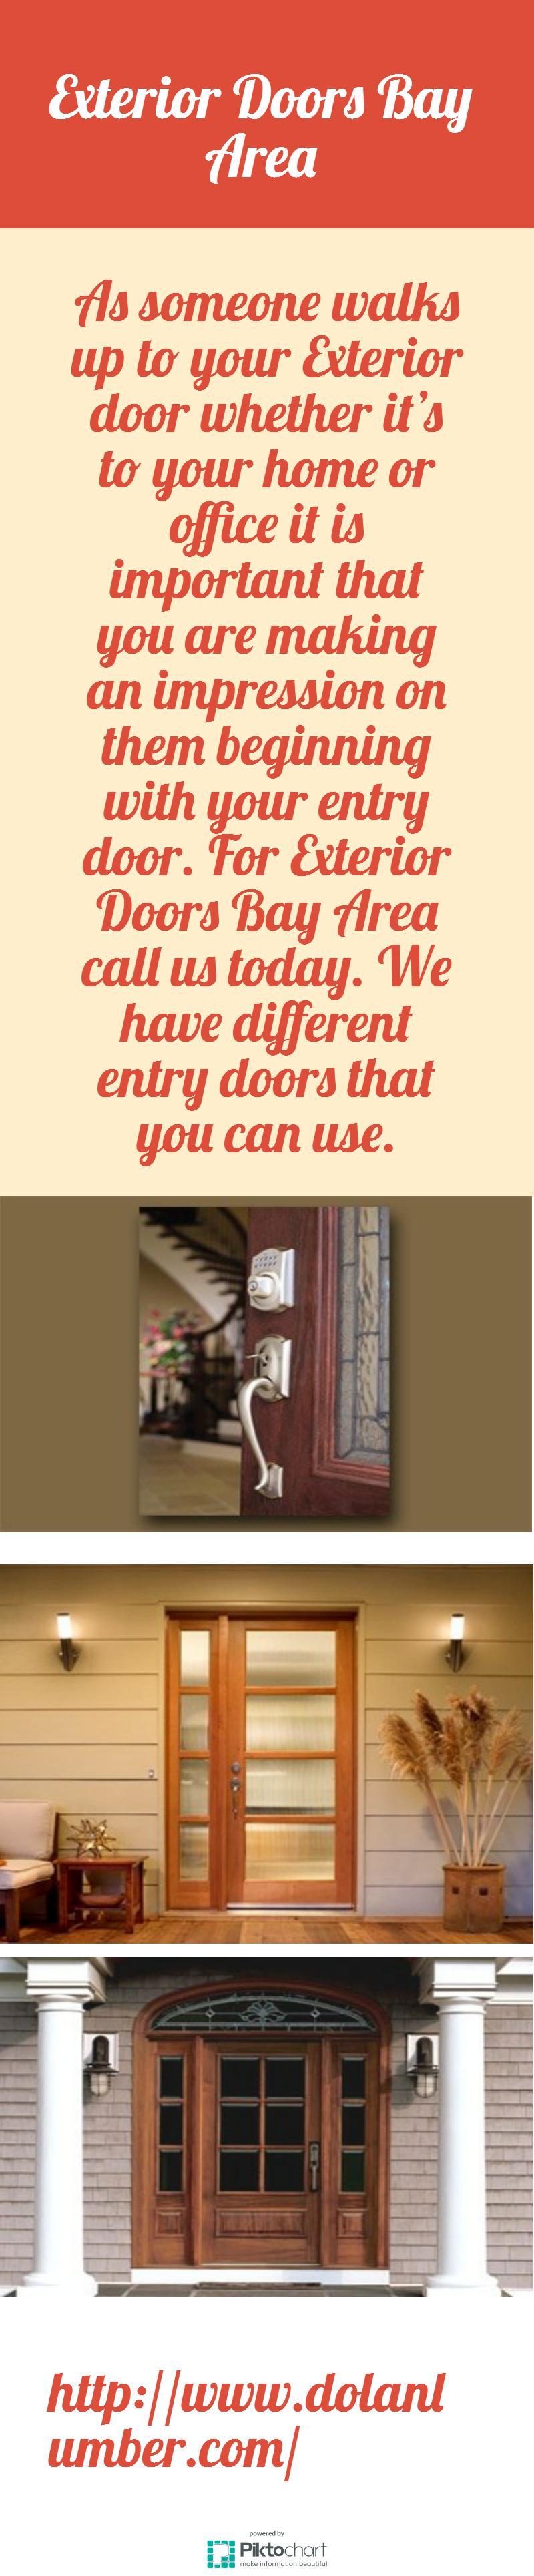 Pin by dolanlumber on Exterior Doors Bay Area | Pinterest